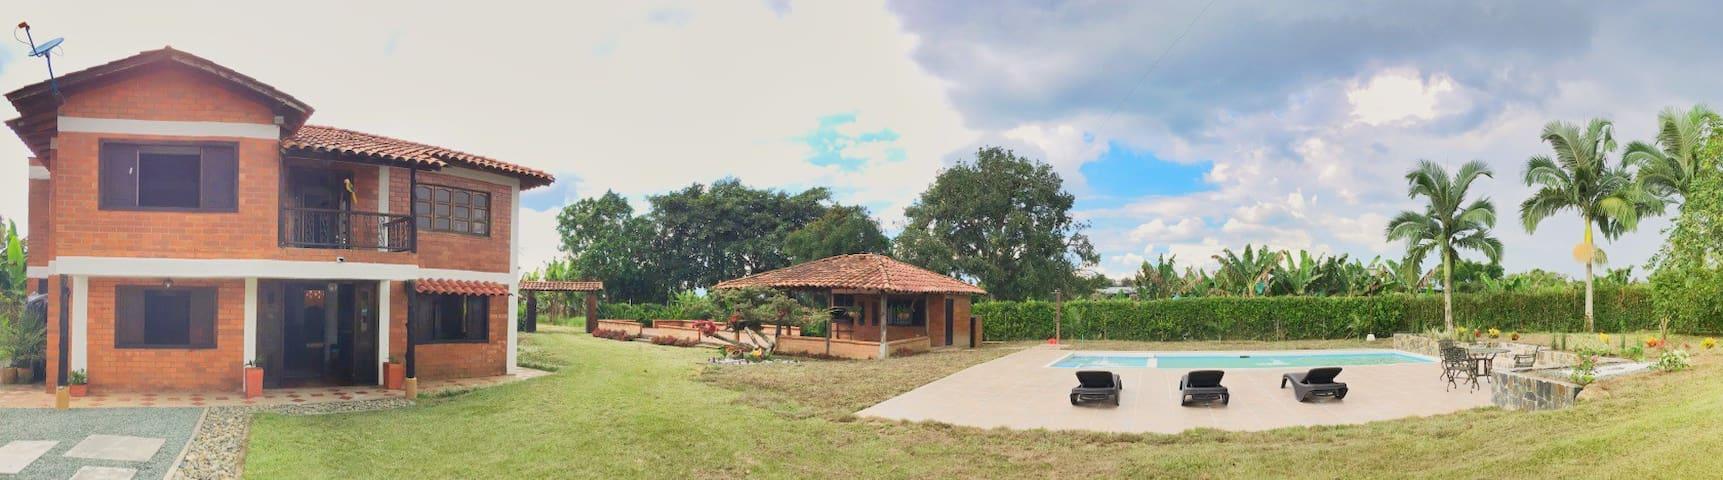 Tierra Labrantia Finca Campestre - Quimbaya - 自然小屋